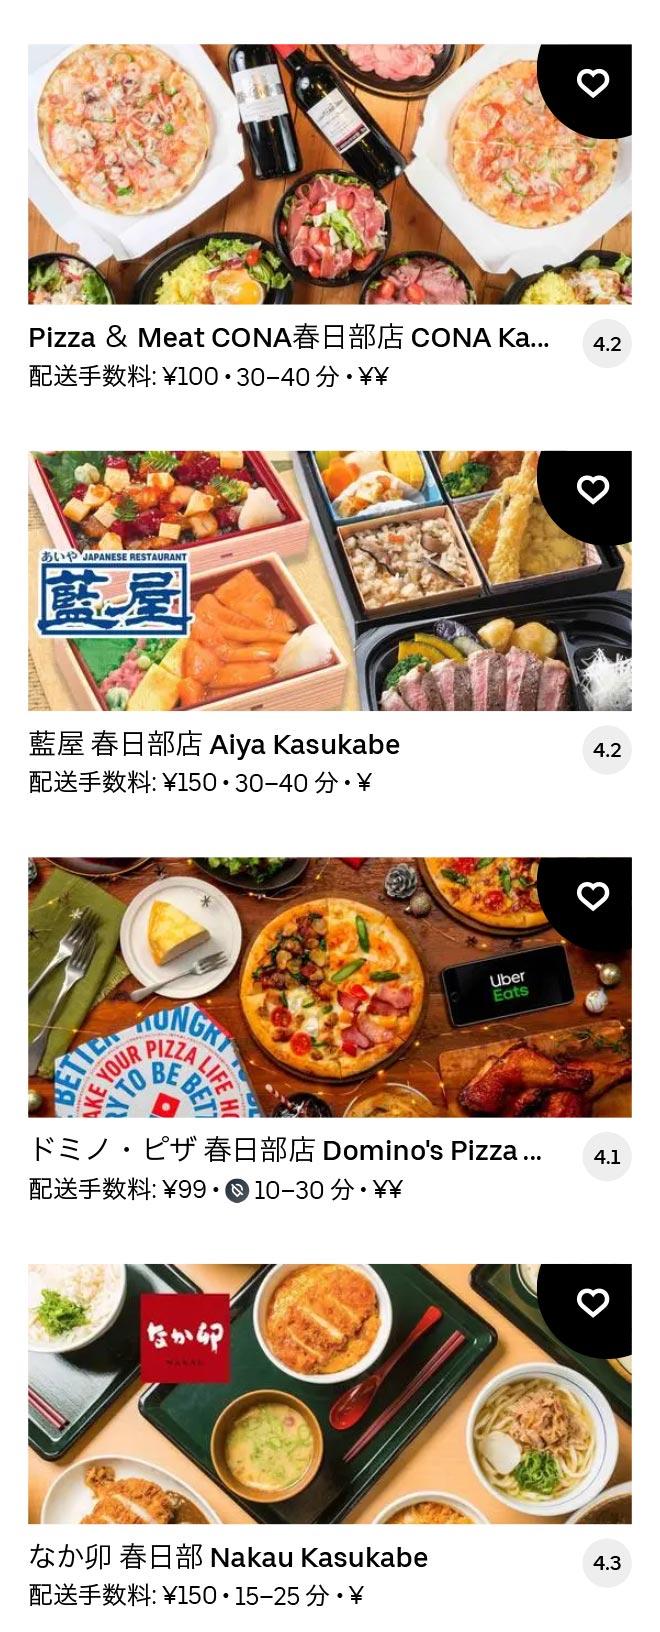 Kasukabe menu 2101 05